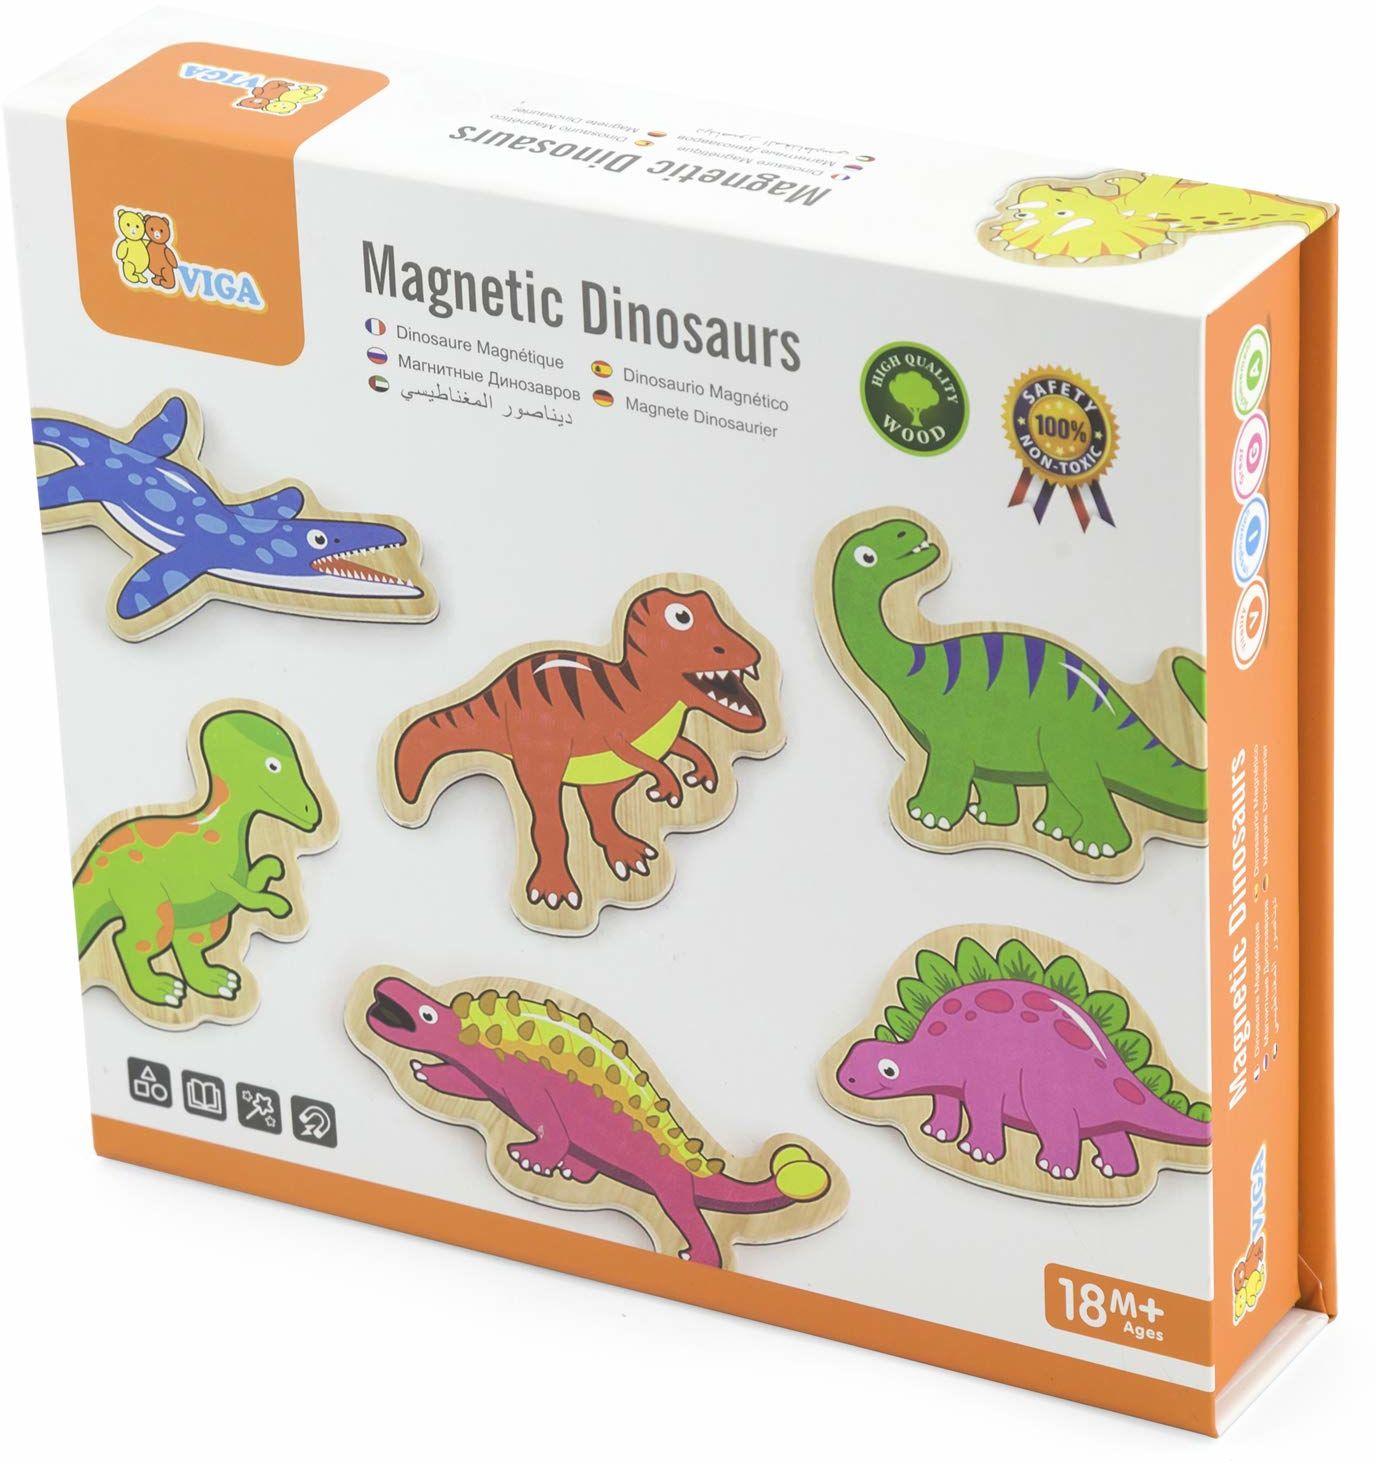 Viga 50289 zabawki - drewniane dinozaury magnetyczne - 20 sztuk